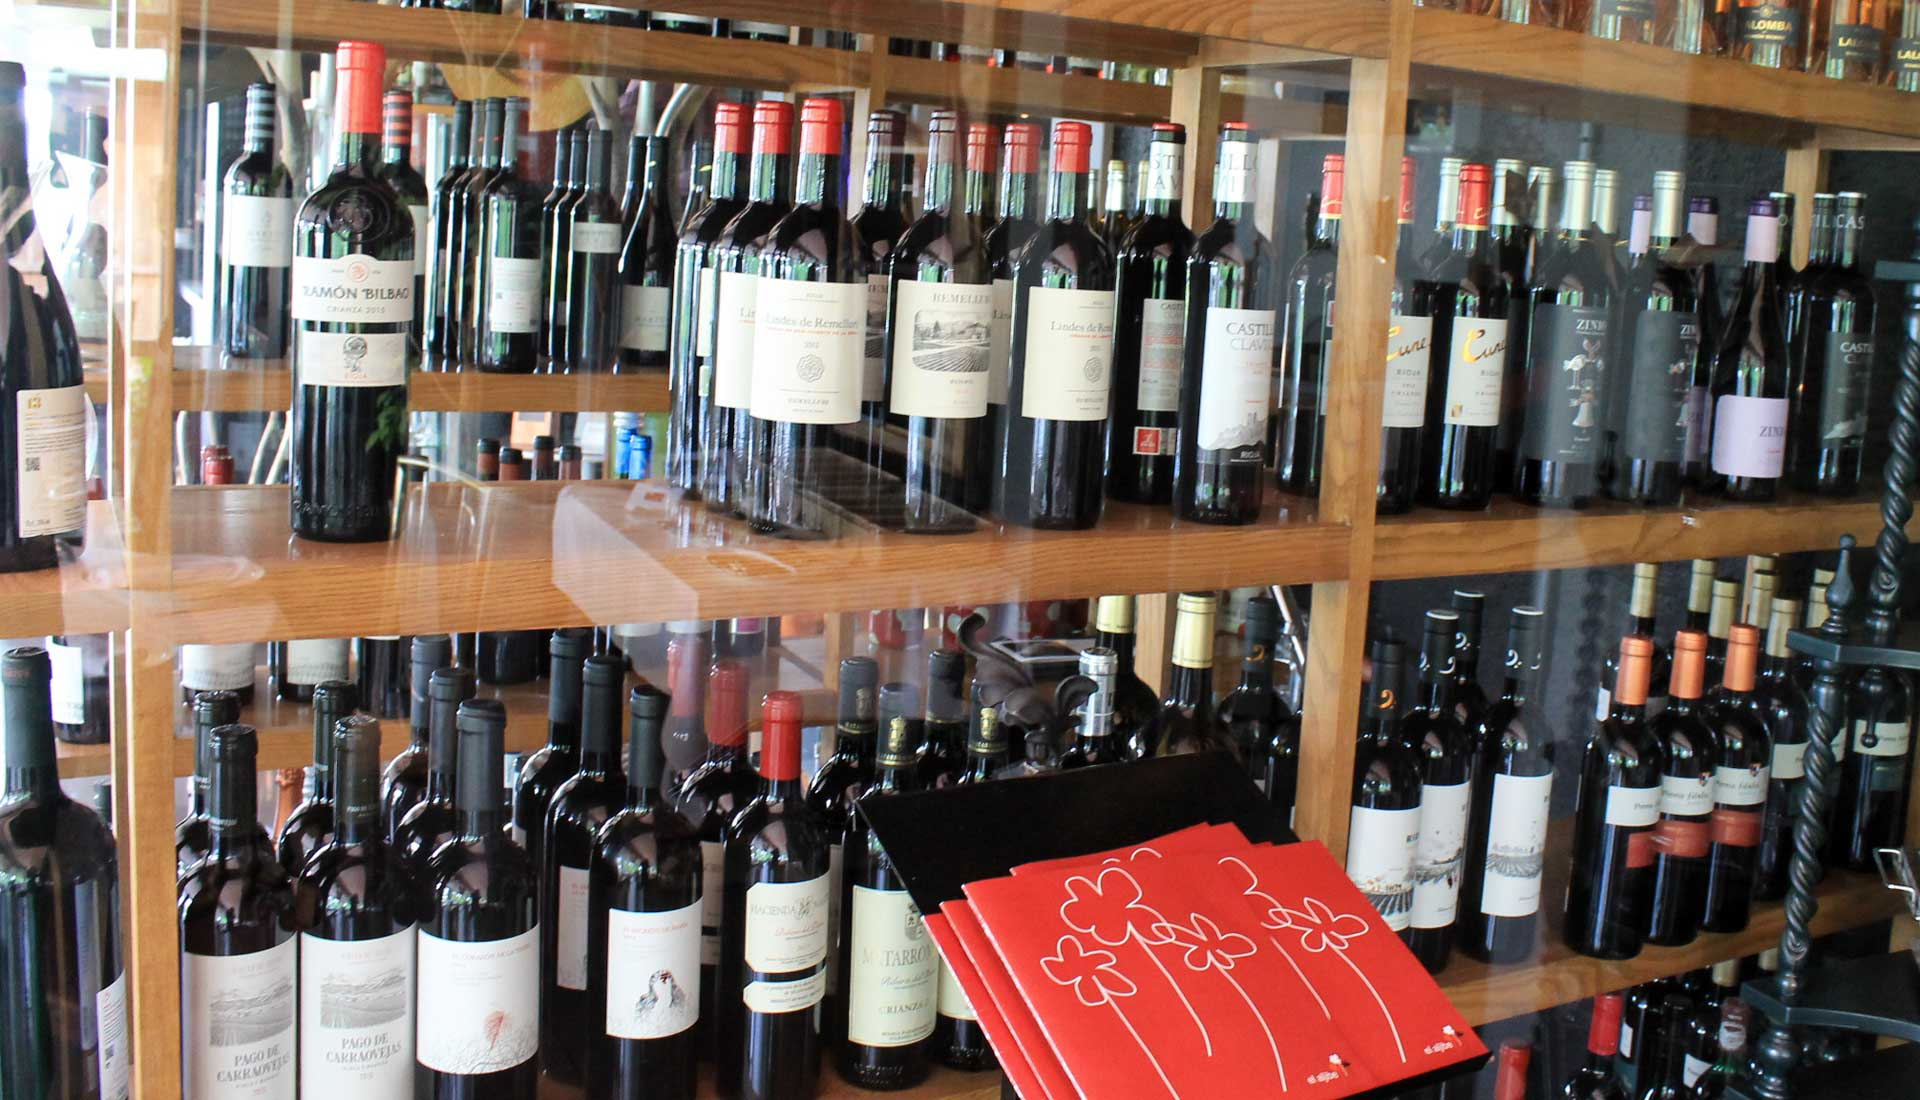 vinacoteca restaurante el aljibe Serranillos playa cerca de Talavera